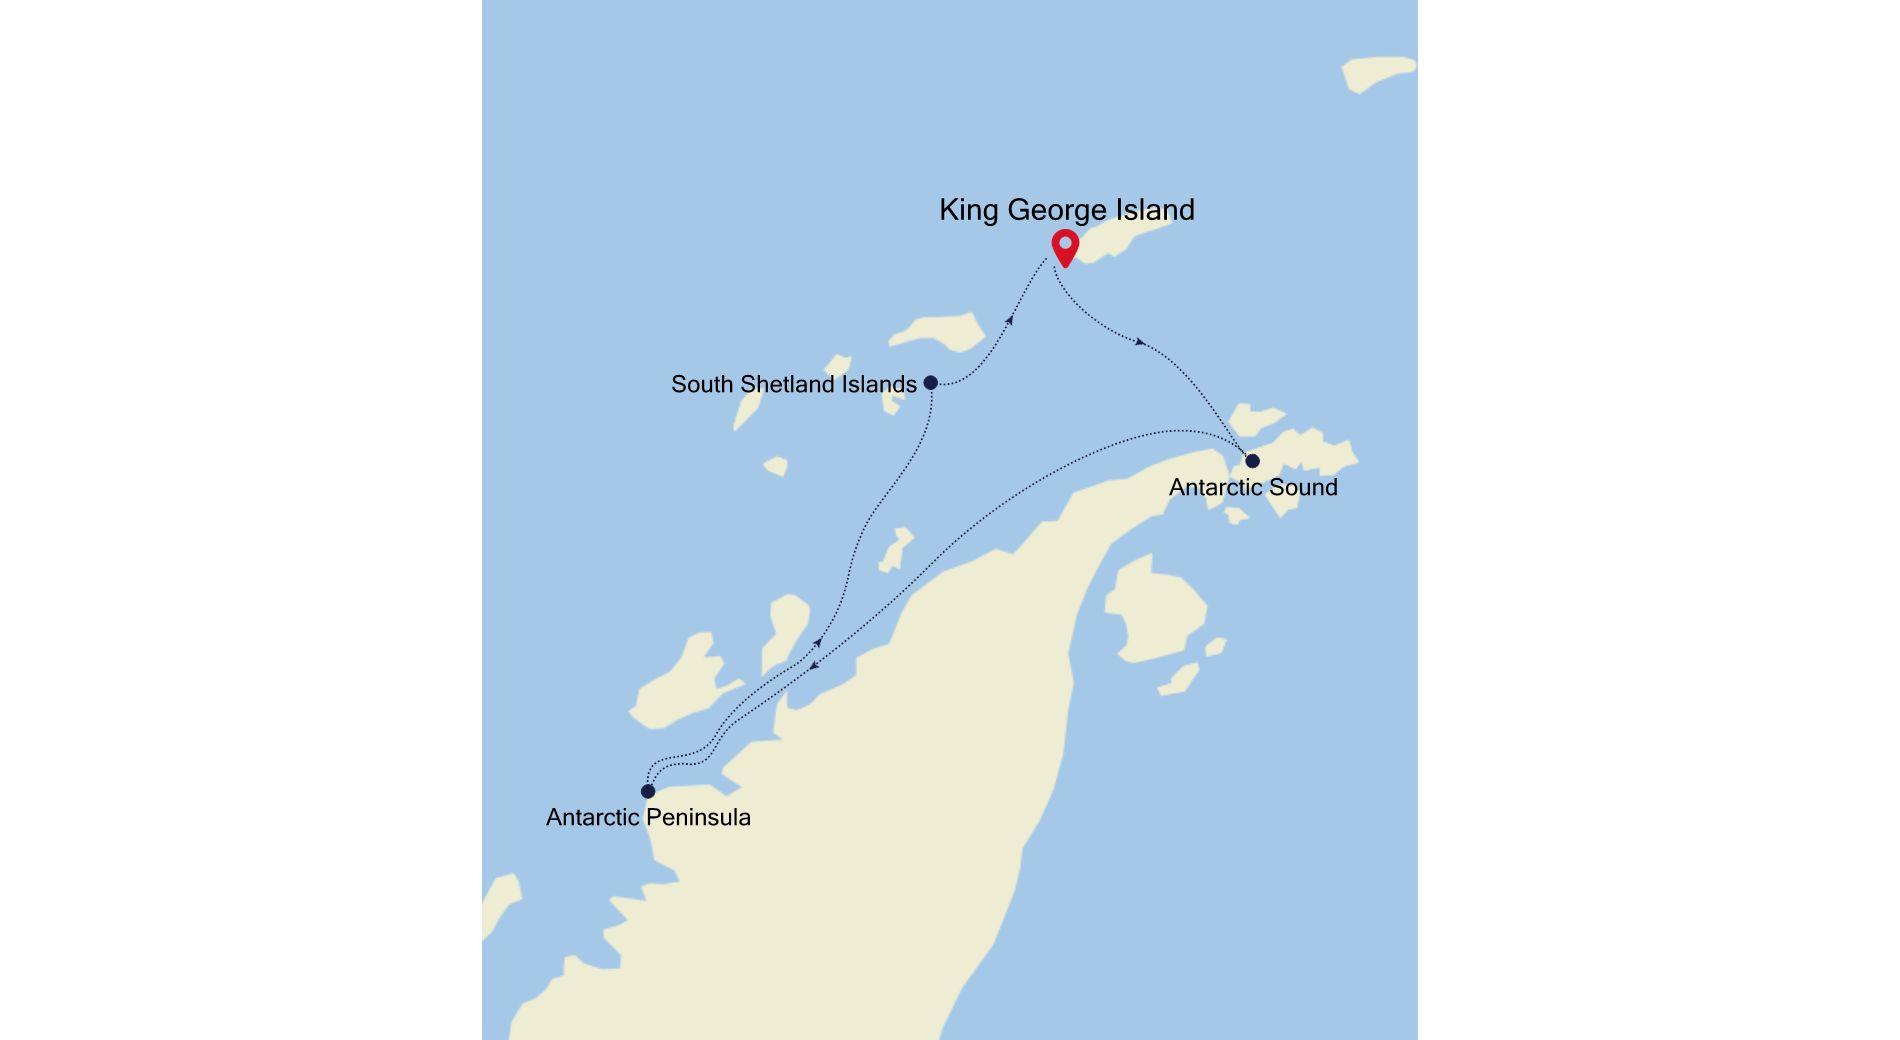 E1220227006 - King George Island to King George Island